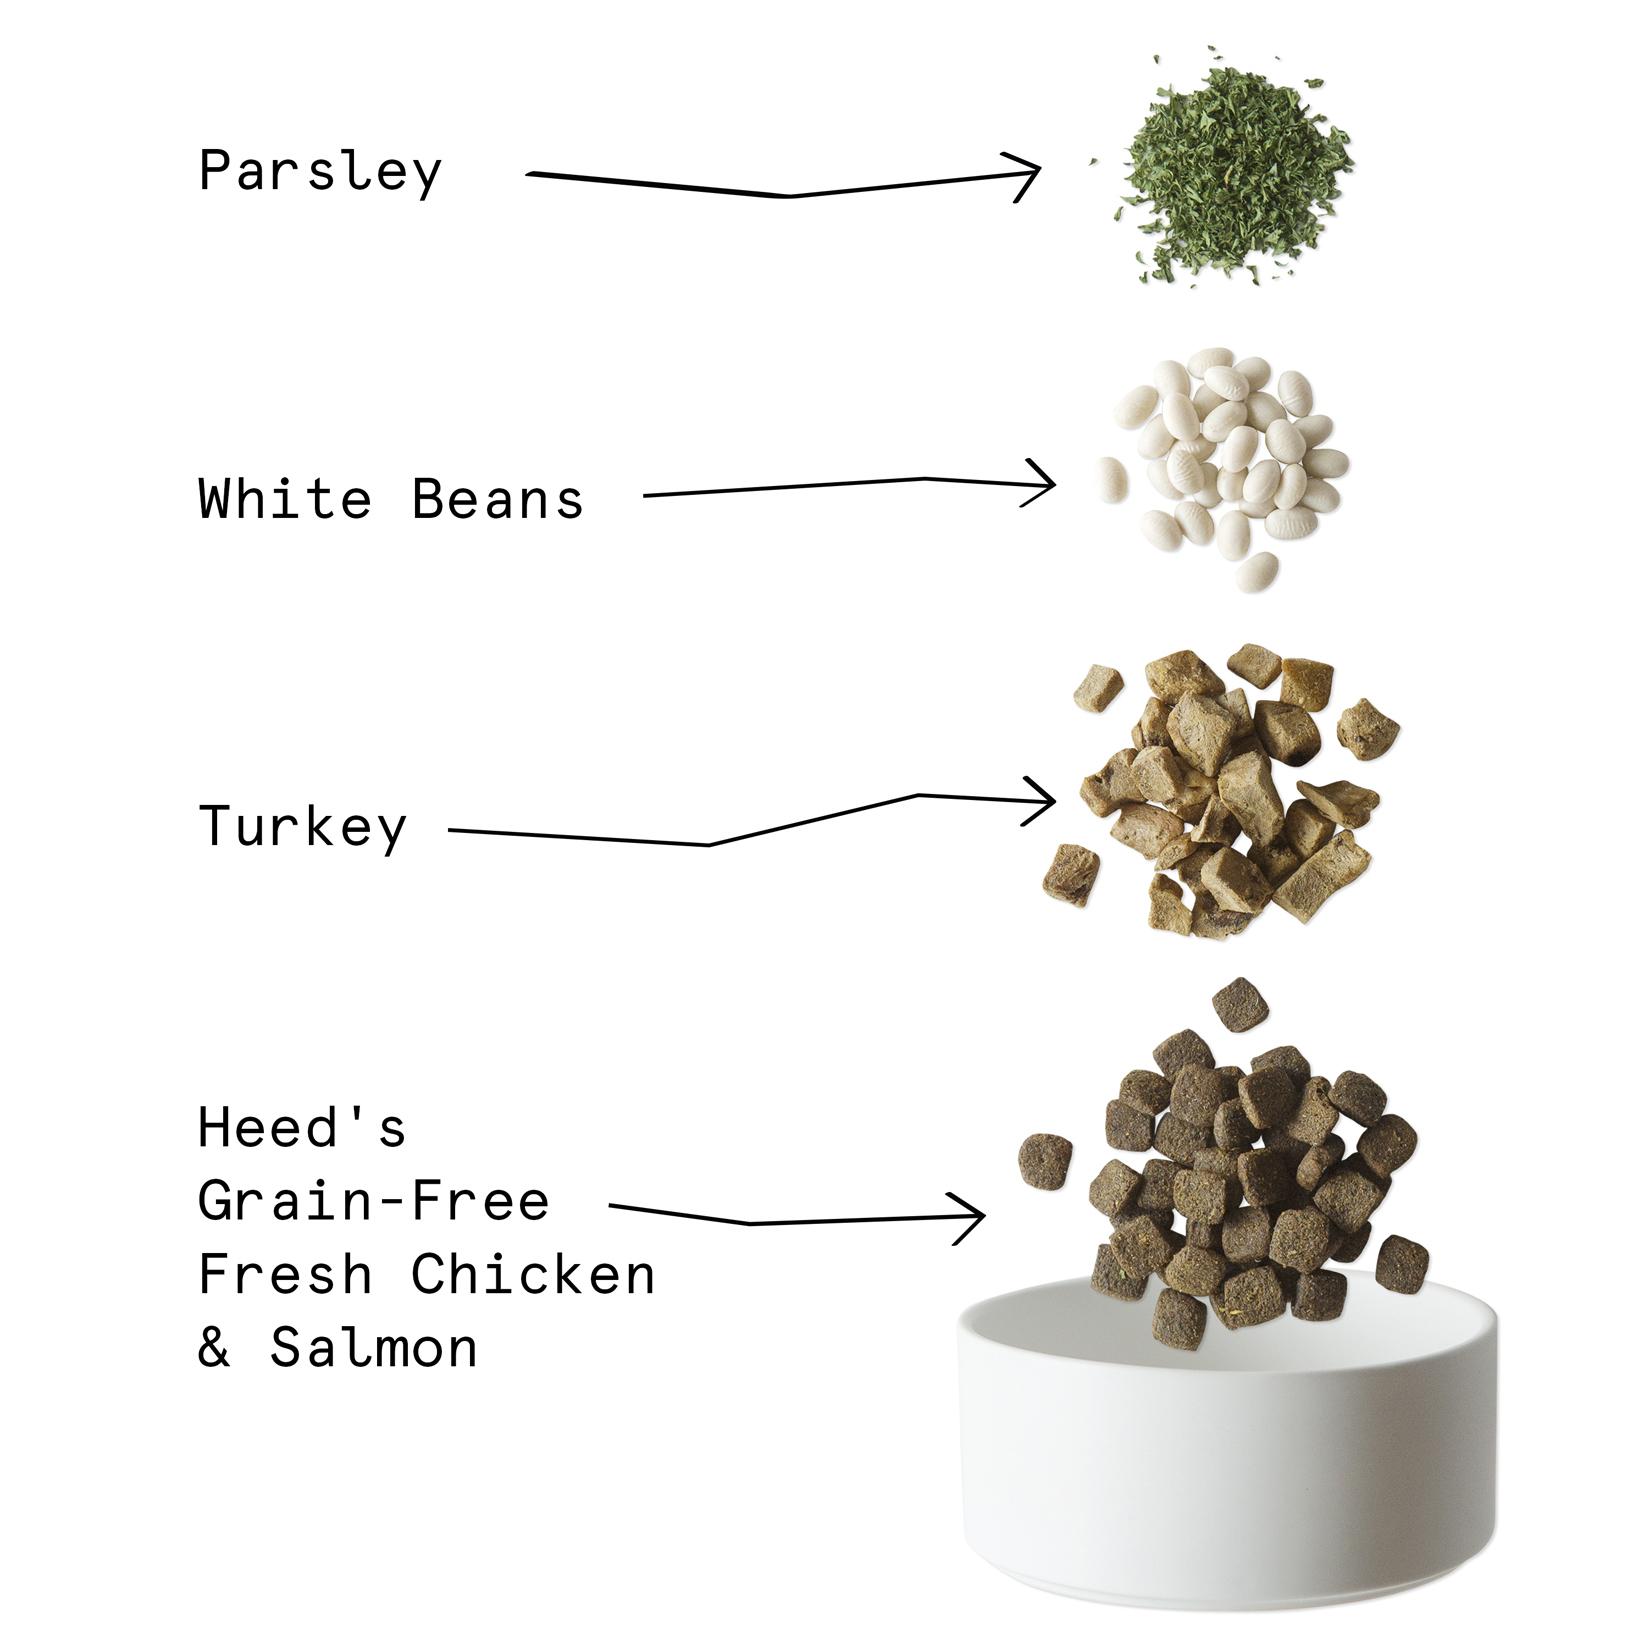 Turkey_Parsley_WhiteBean_02.jpg